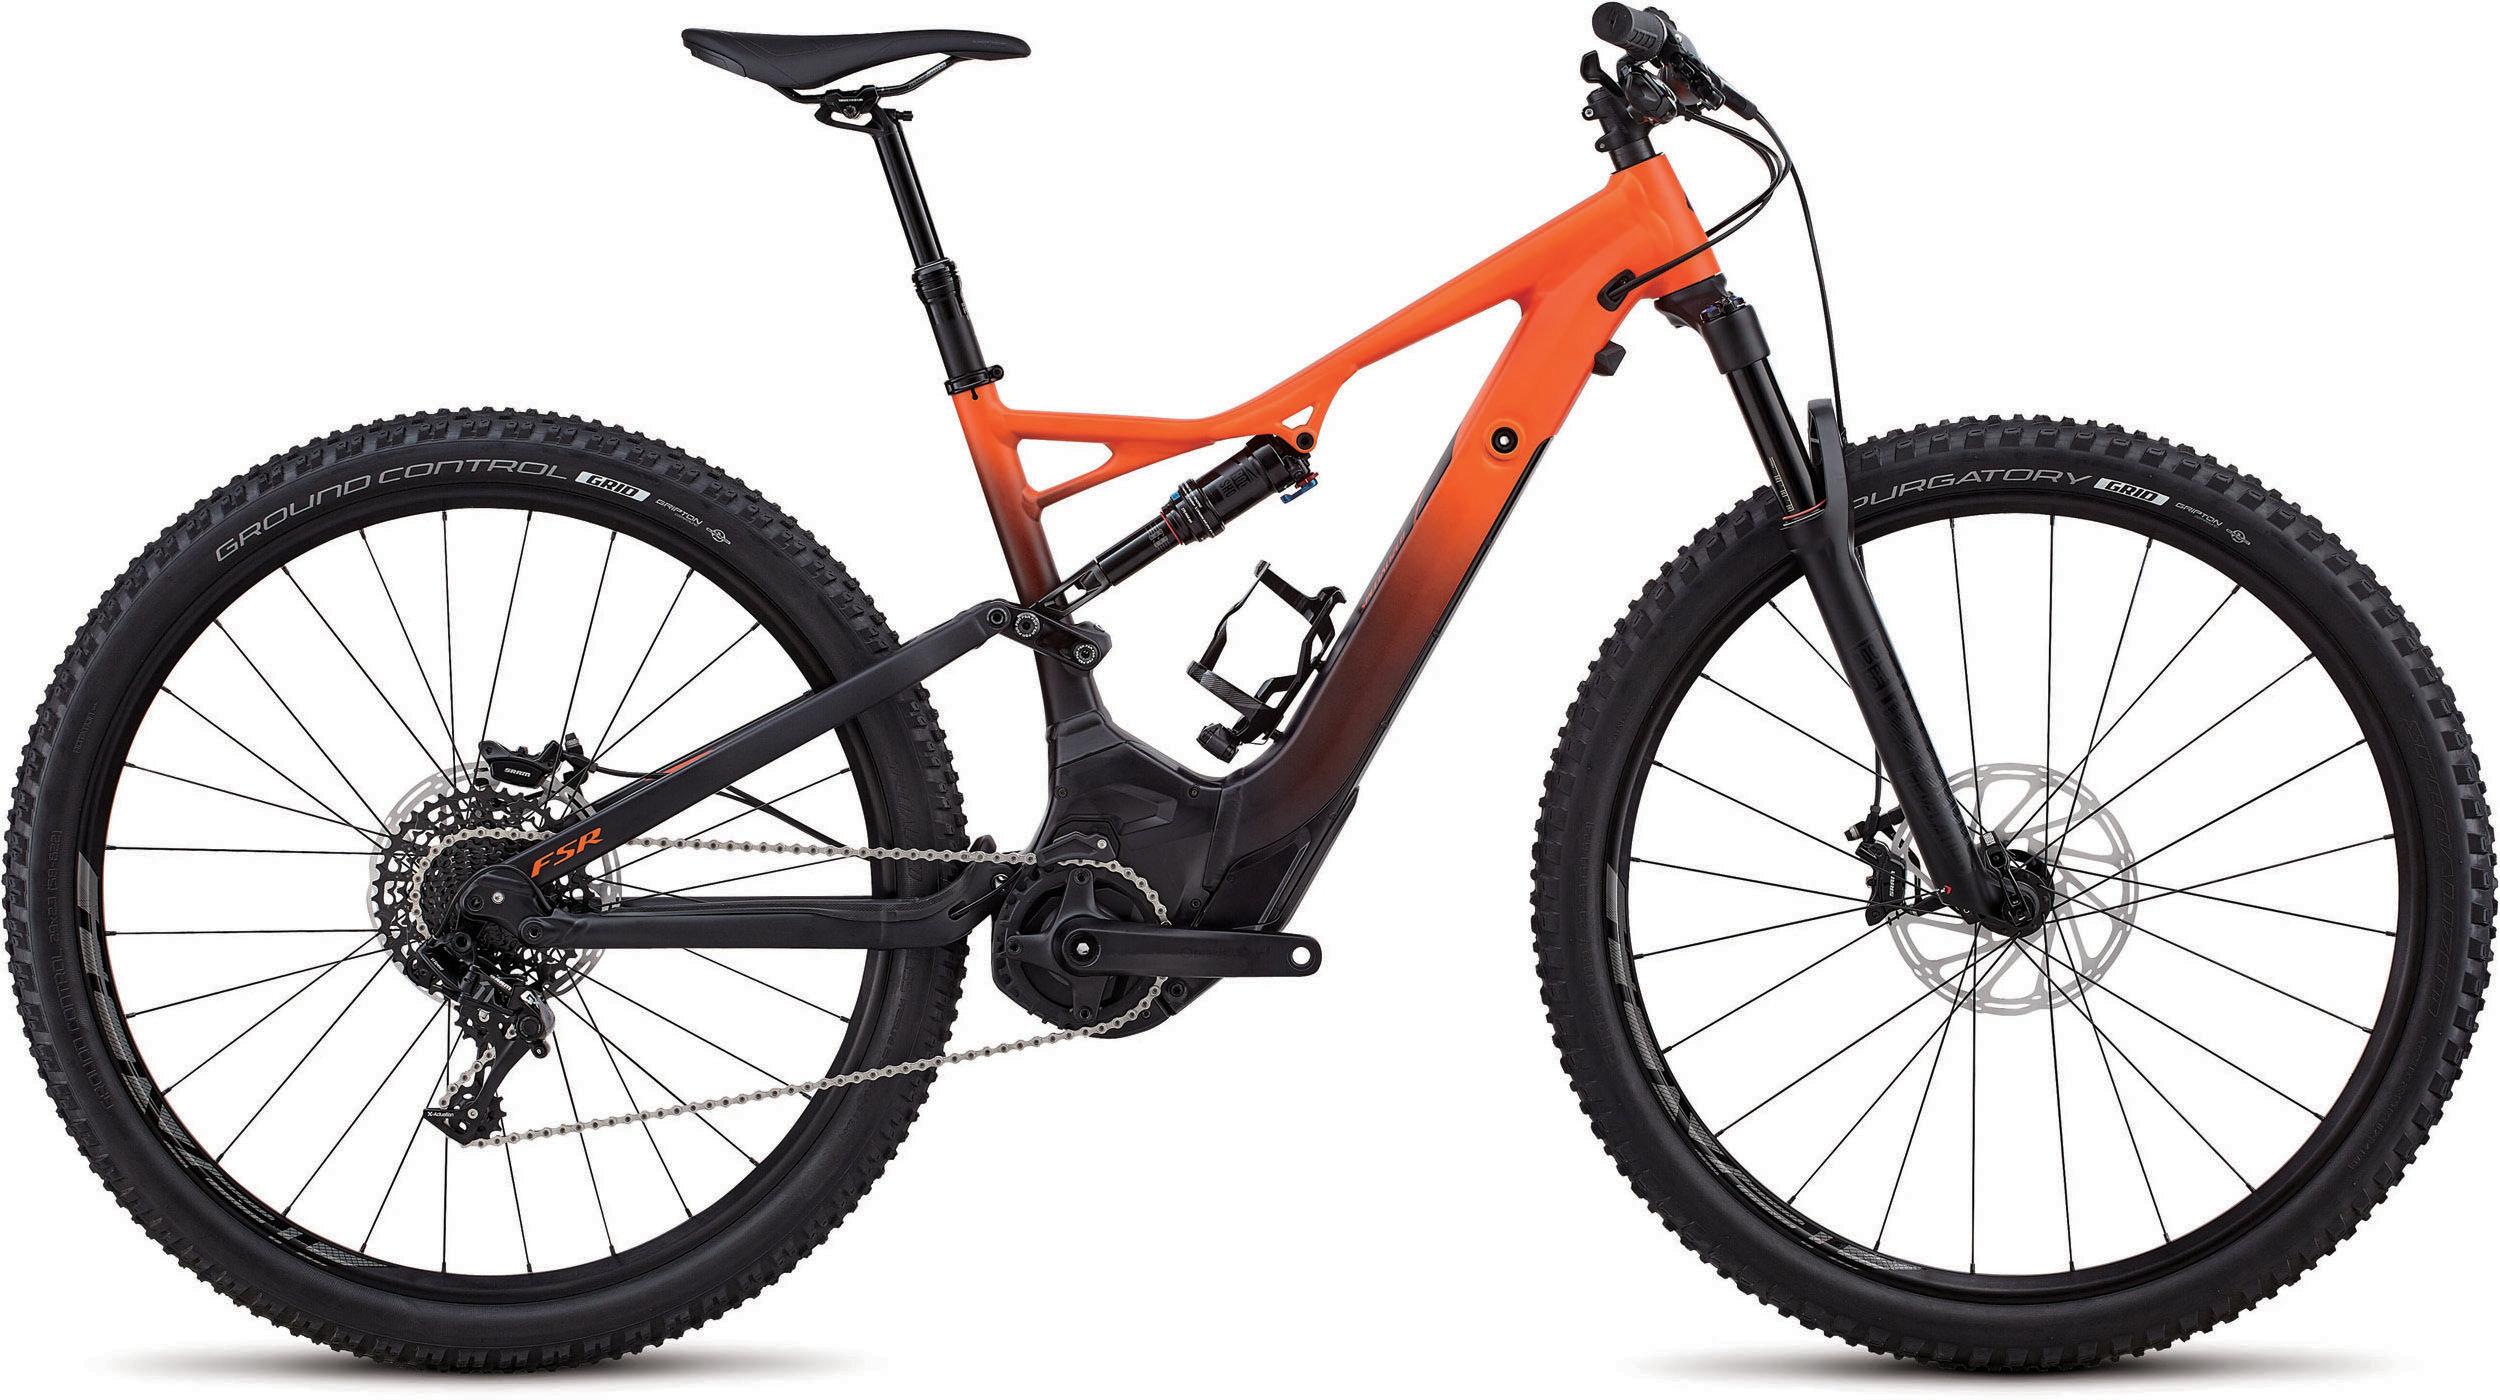 Specialized Men´s Turbo Levo FSR Short Travel Comp 29 RH L - Fahrrad online kaufen | Online Shop Bike Profis